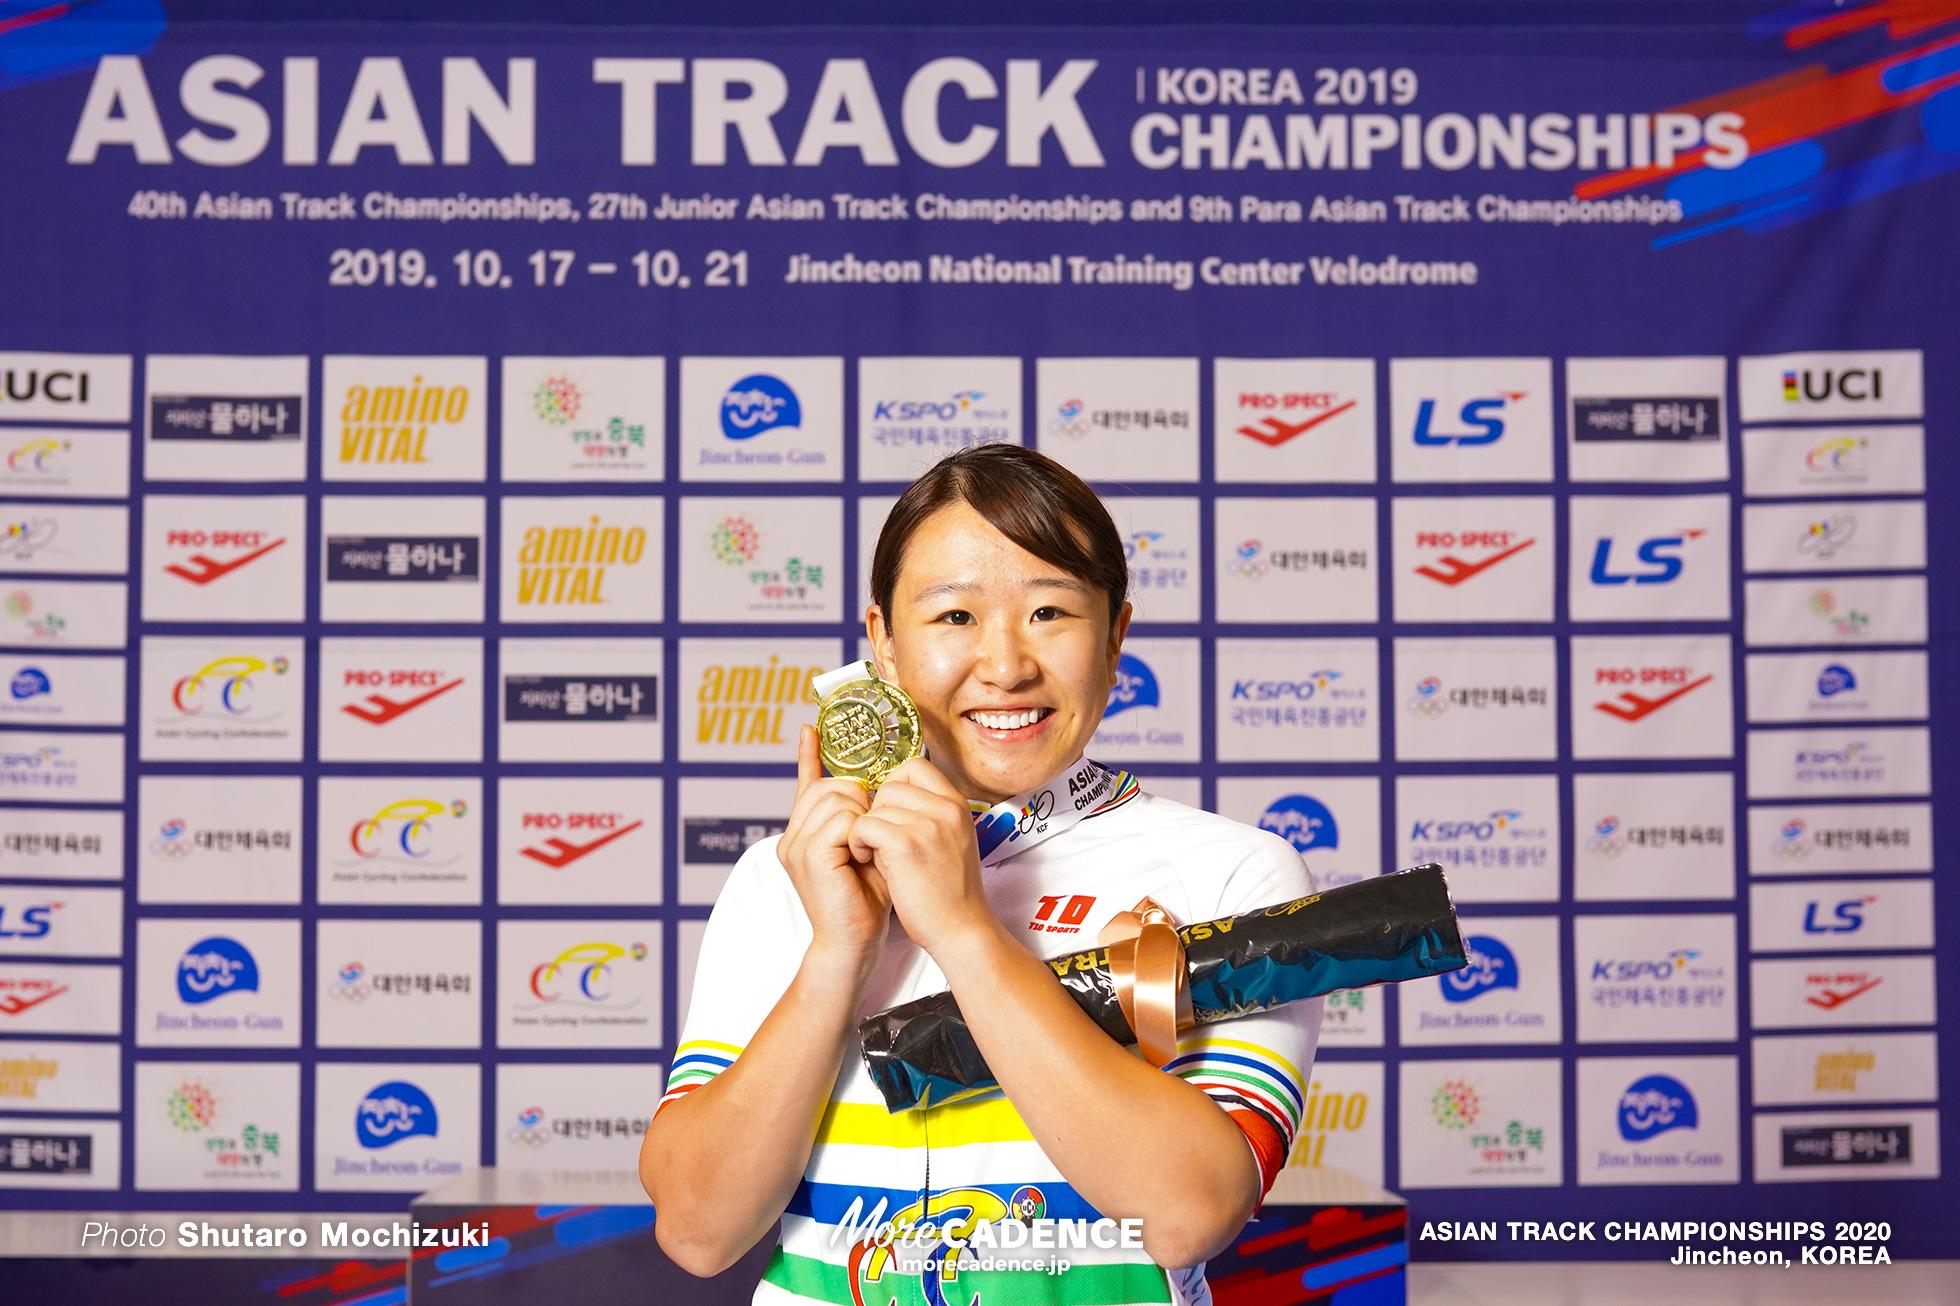 Point Race / Women Omnium / ASIAN TRACK CHAMPIONSHIPS 2020